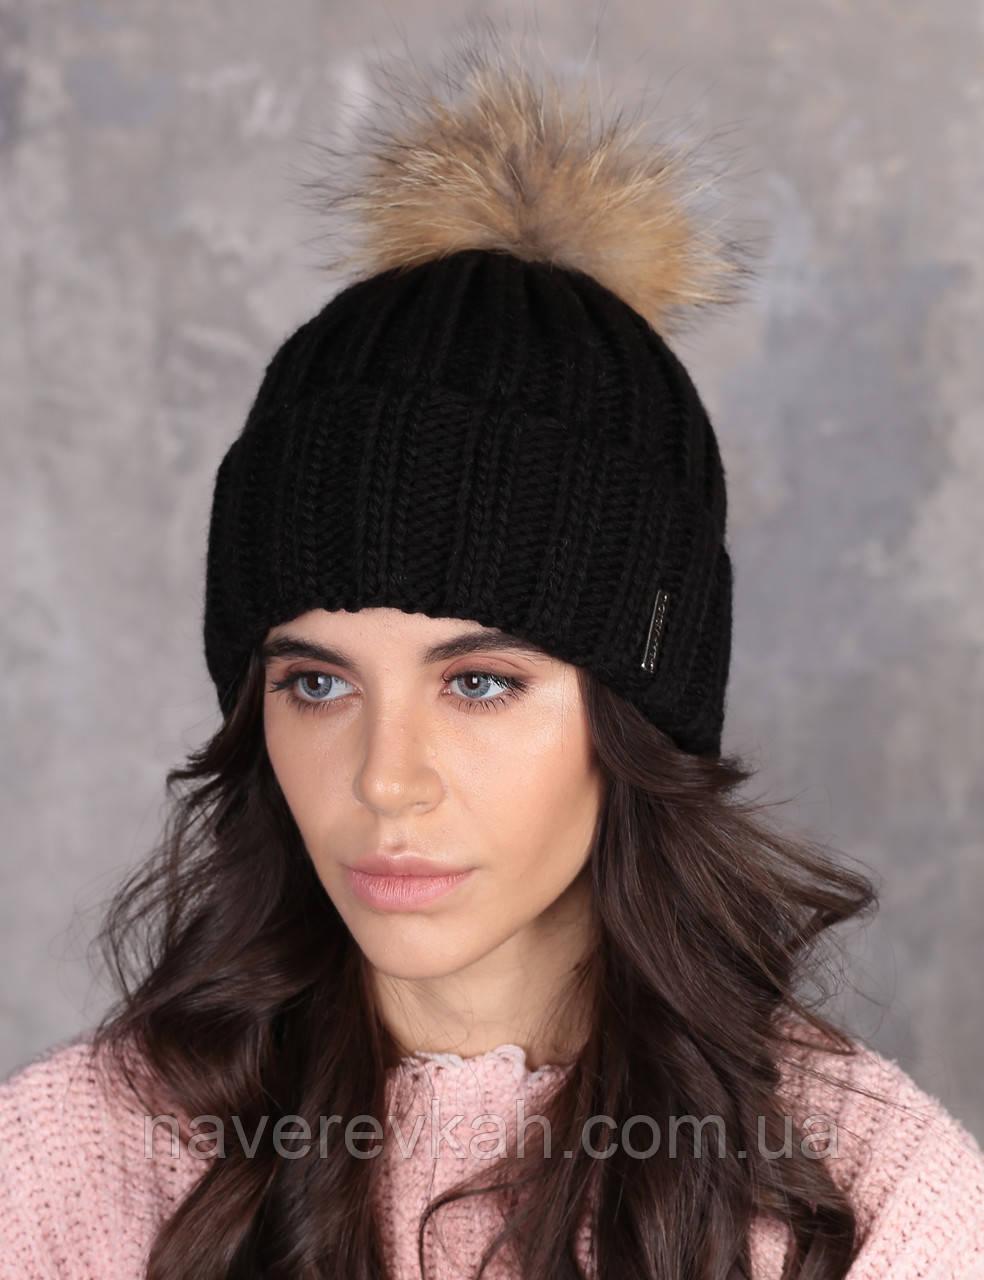 Женская зимняя теплая шапка пряжа с натуральным пампоном